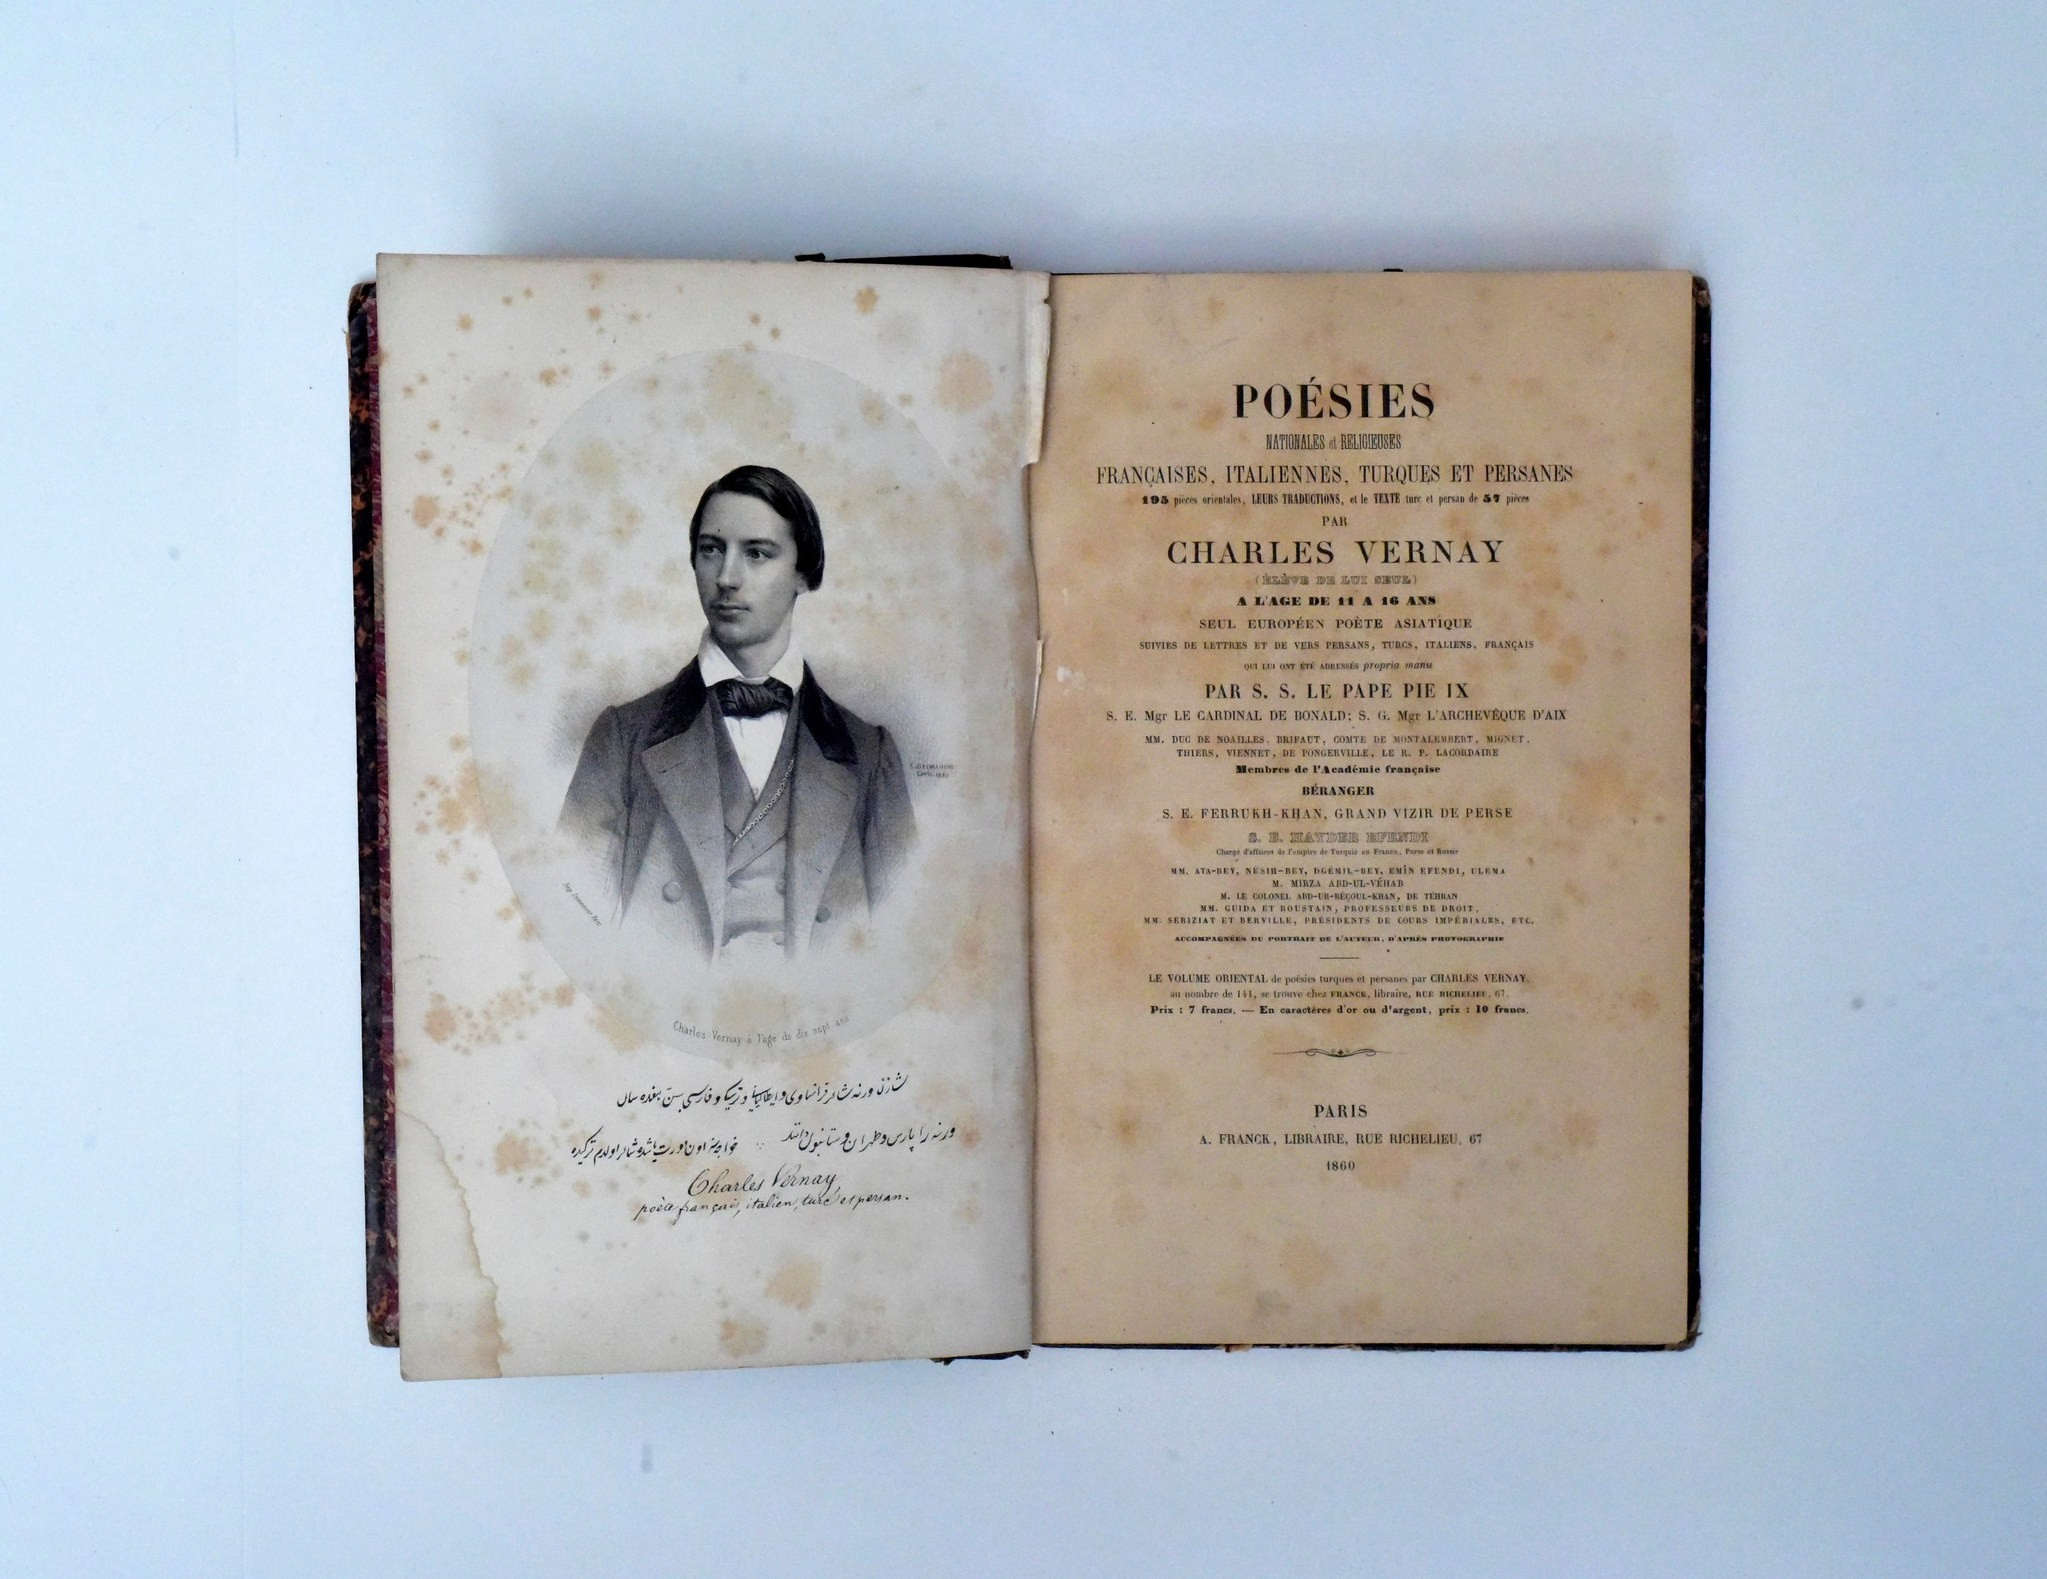 Charles Vernayu2019s poems, published in Paris.